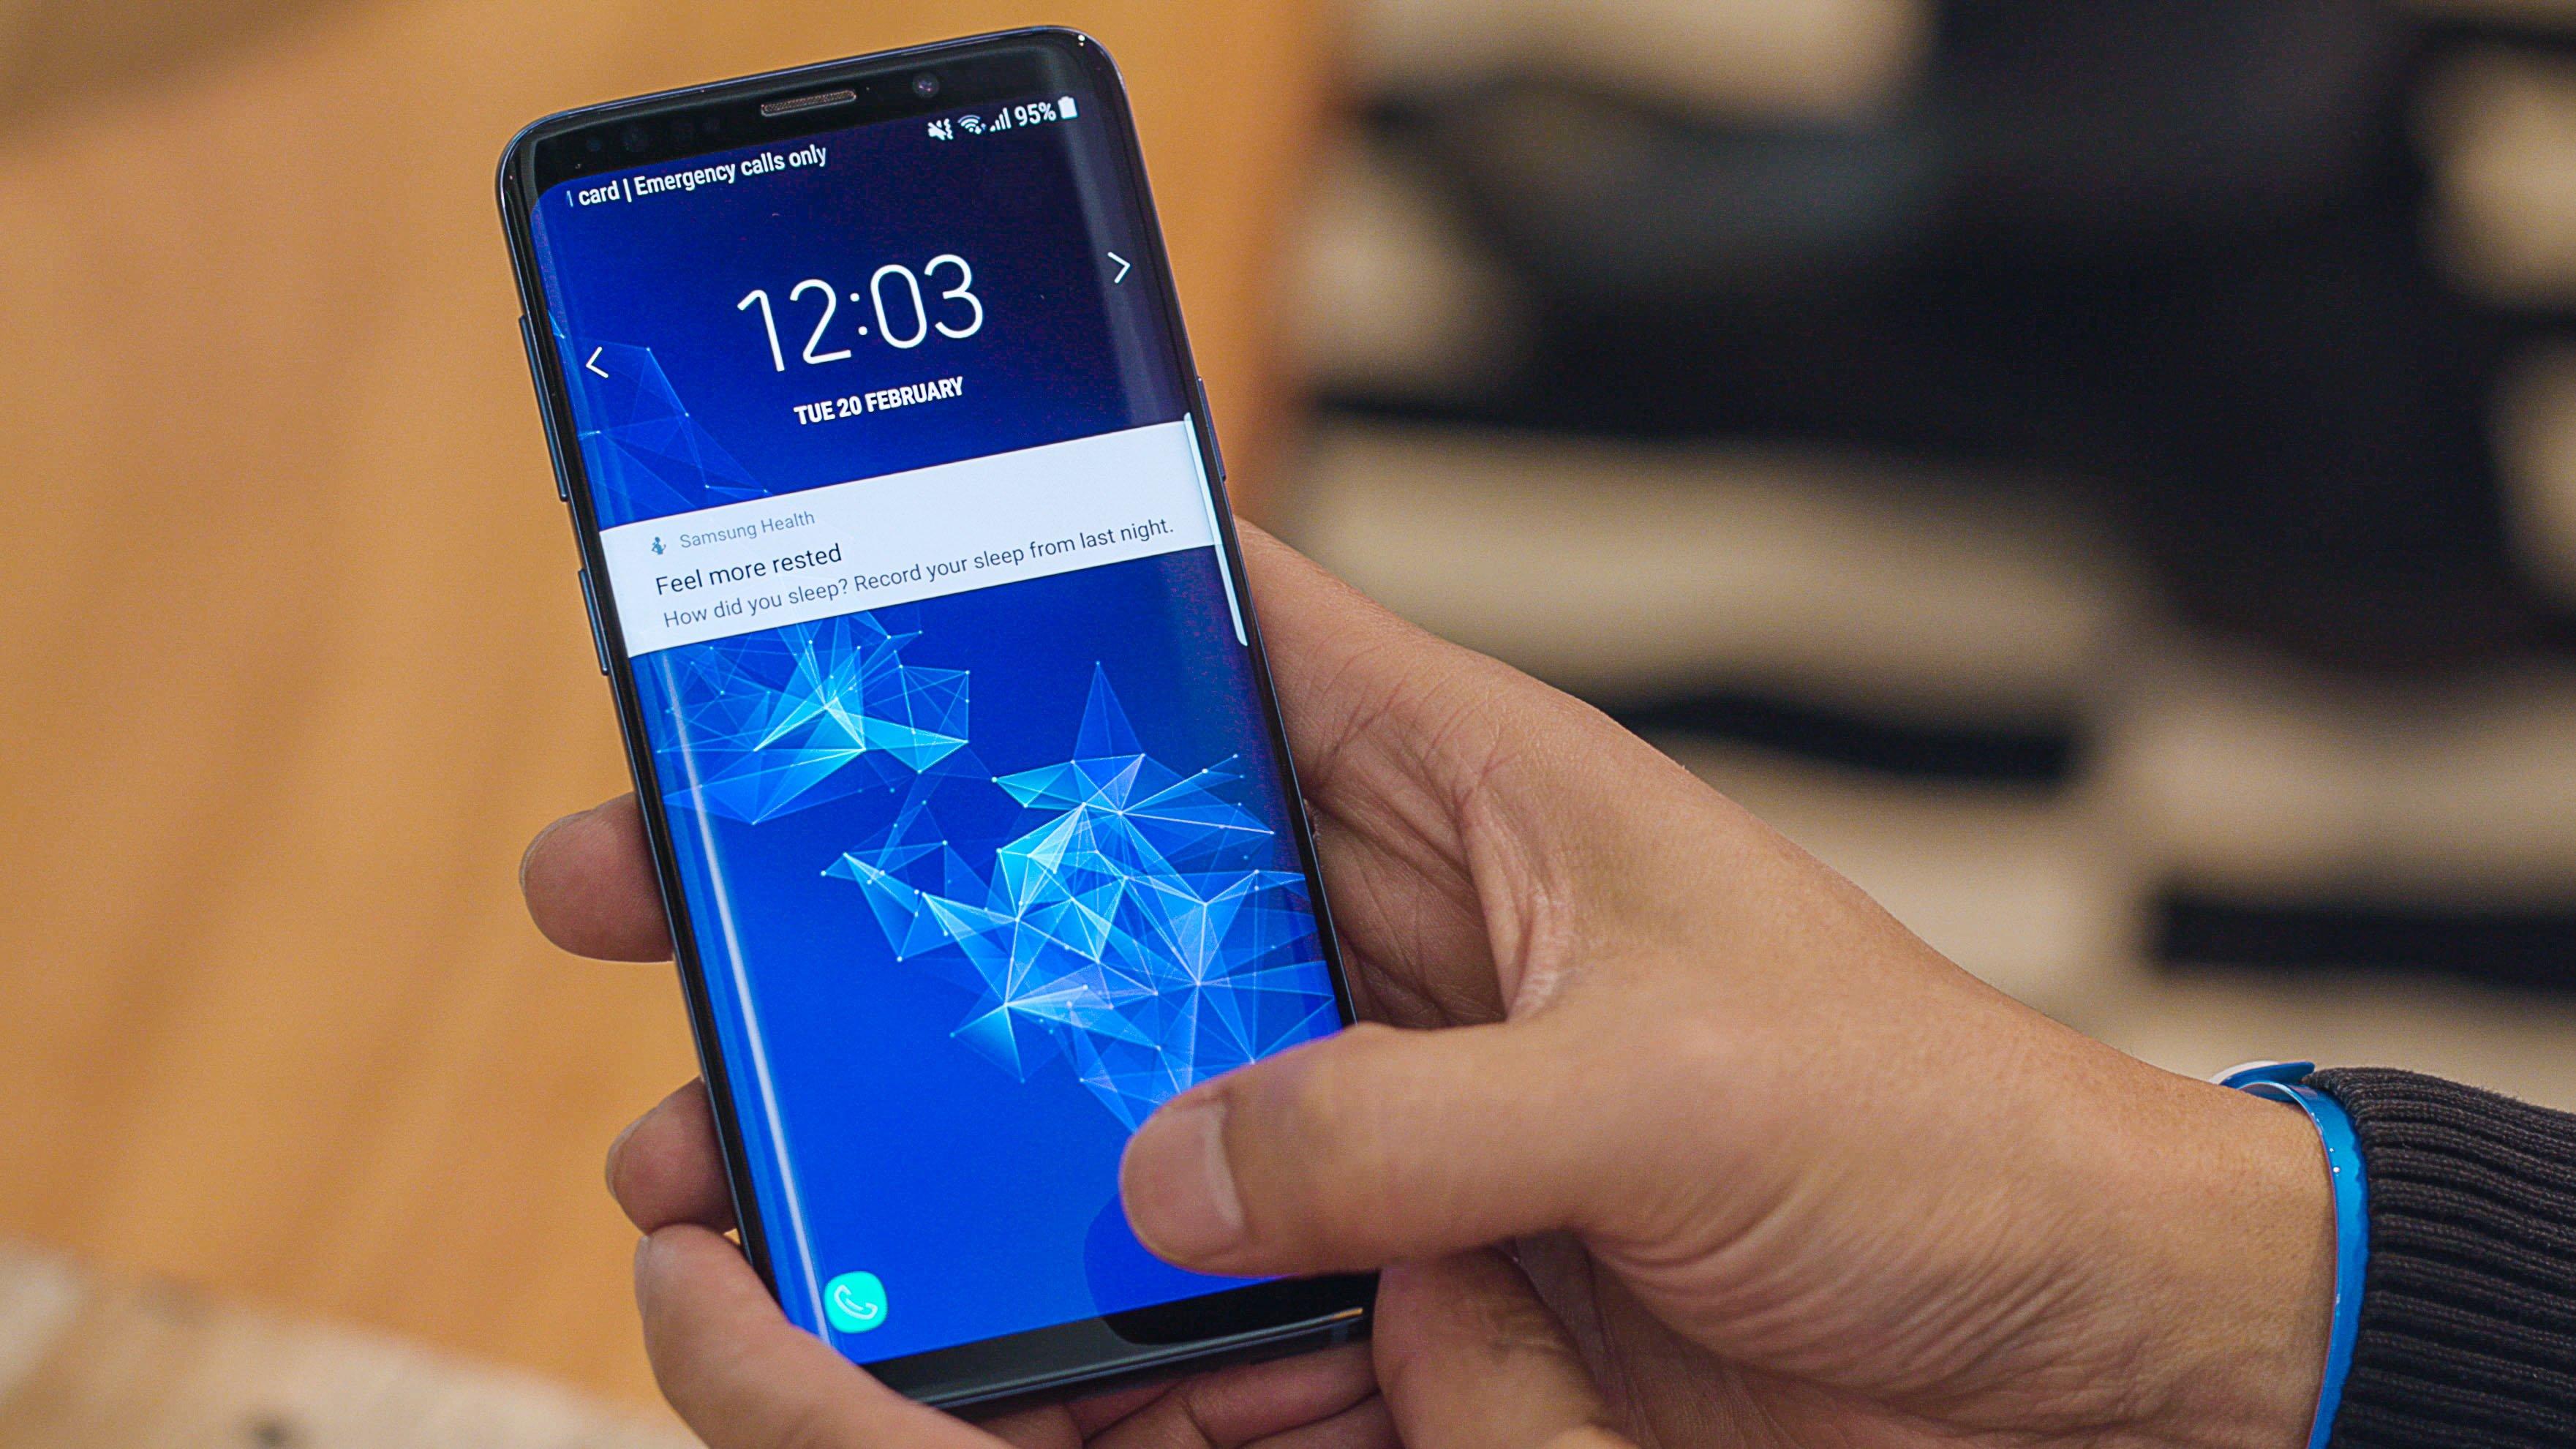 Apple IPhone Xr Vs Samsung Galaxy S9 : Le Duel éternel